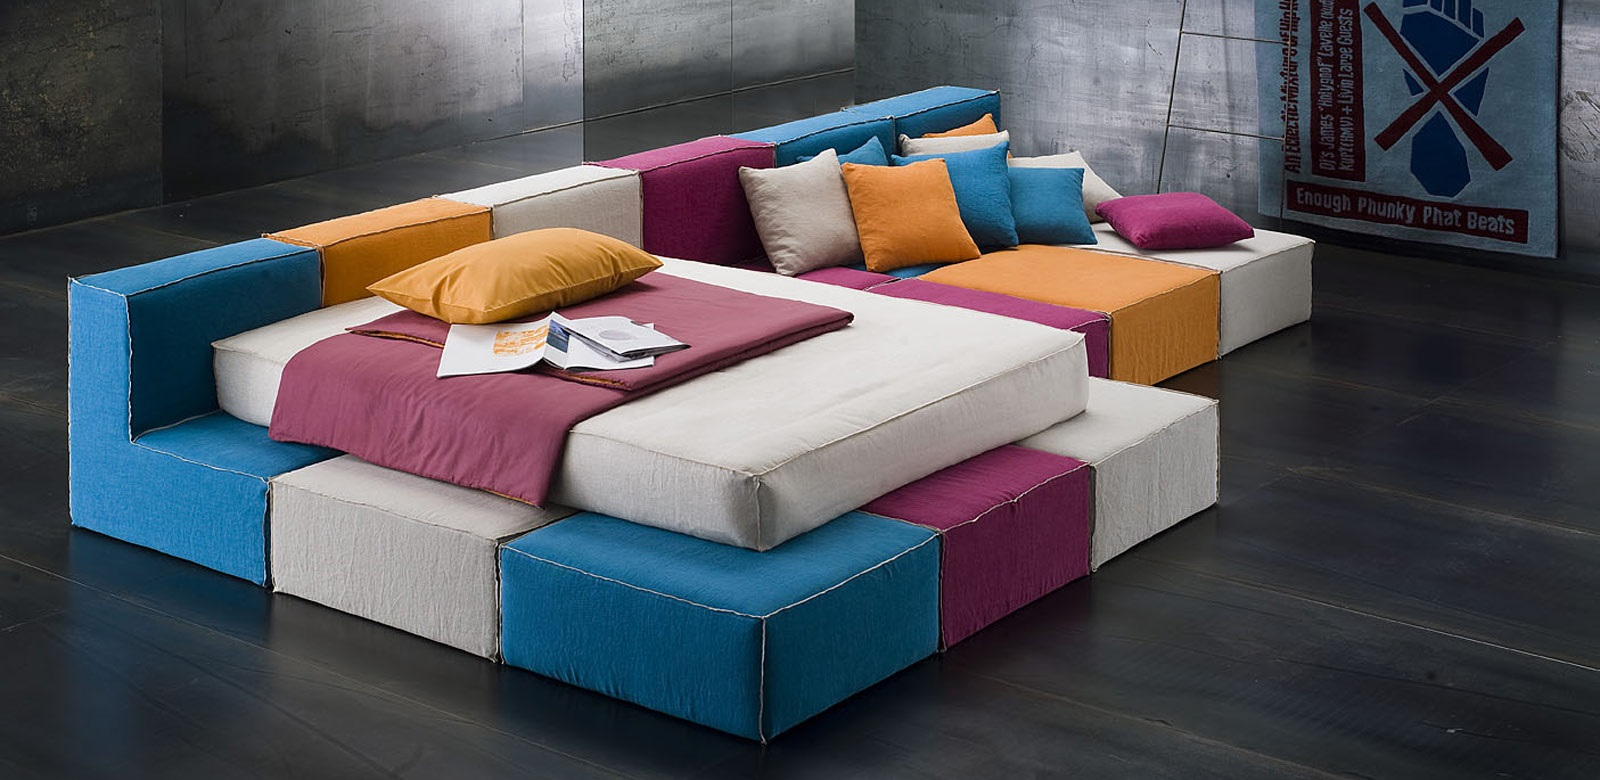 Дизайн бескаркасного дивана